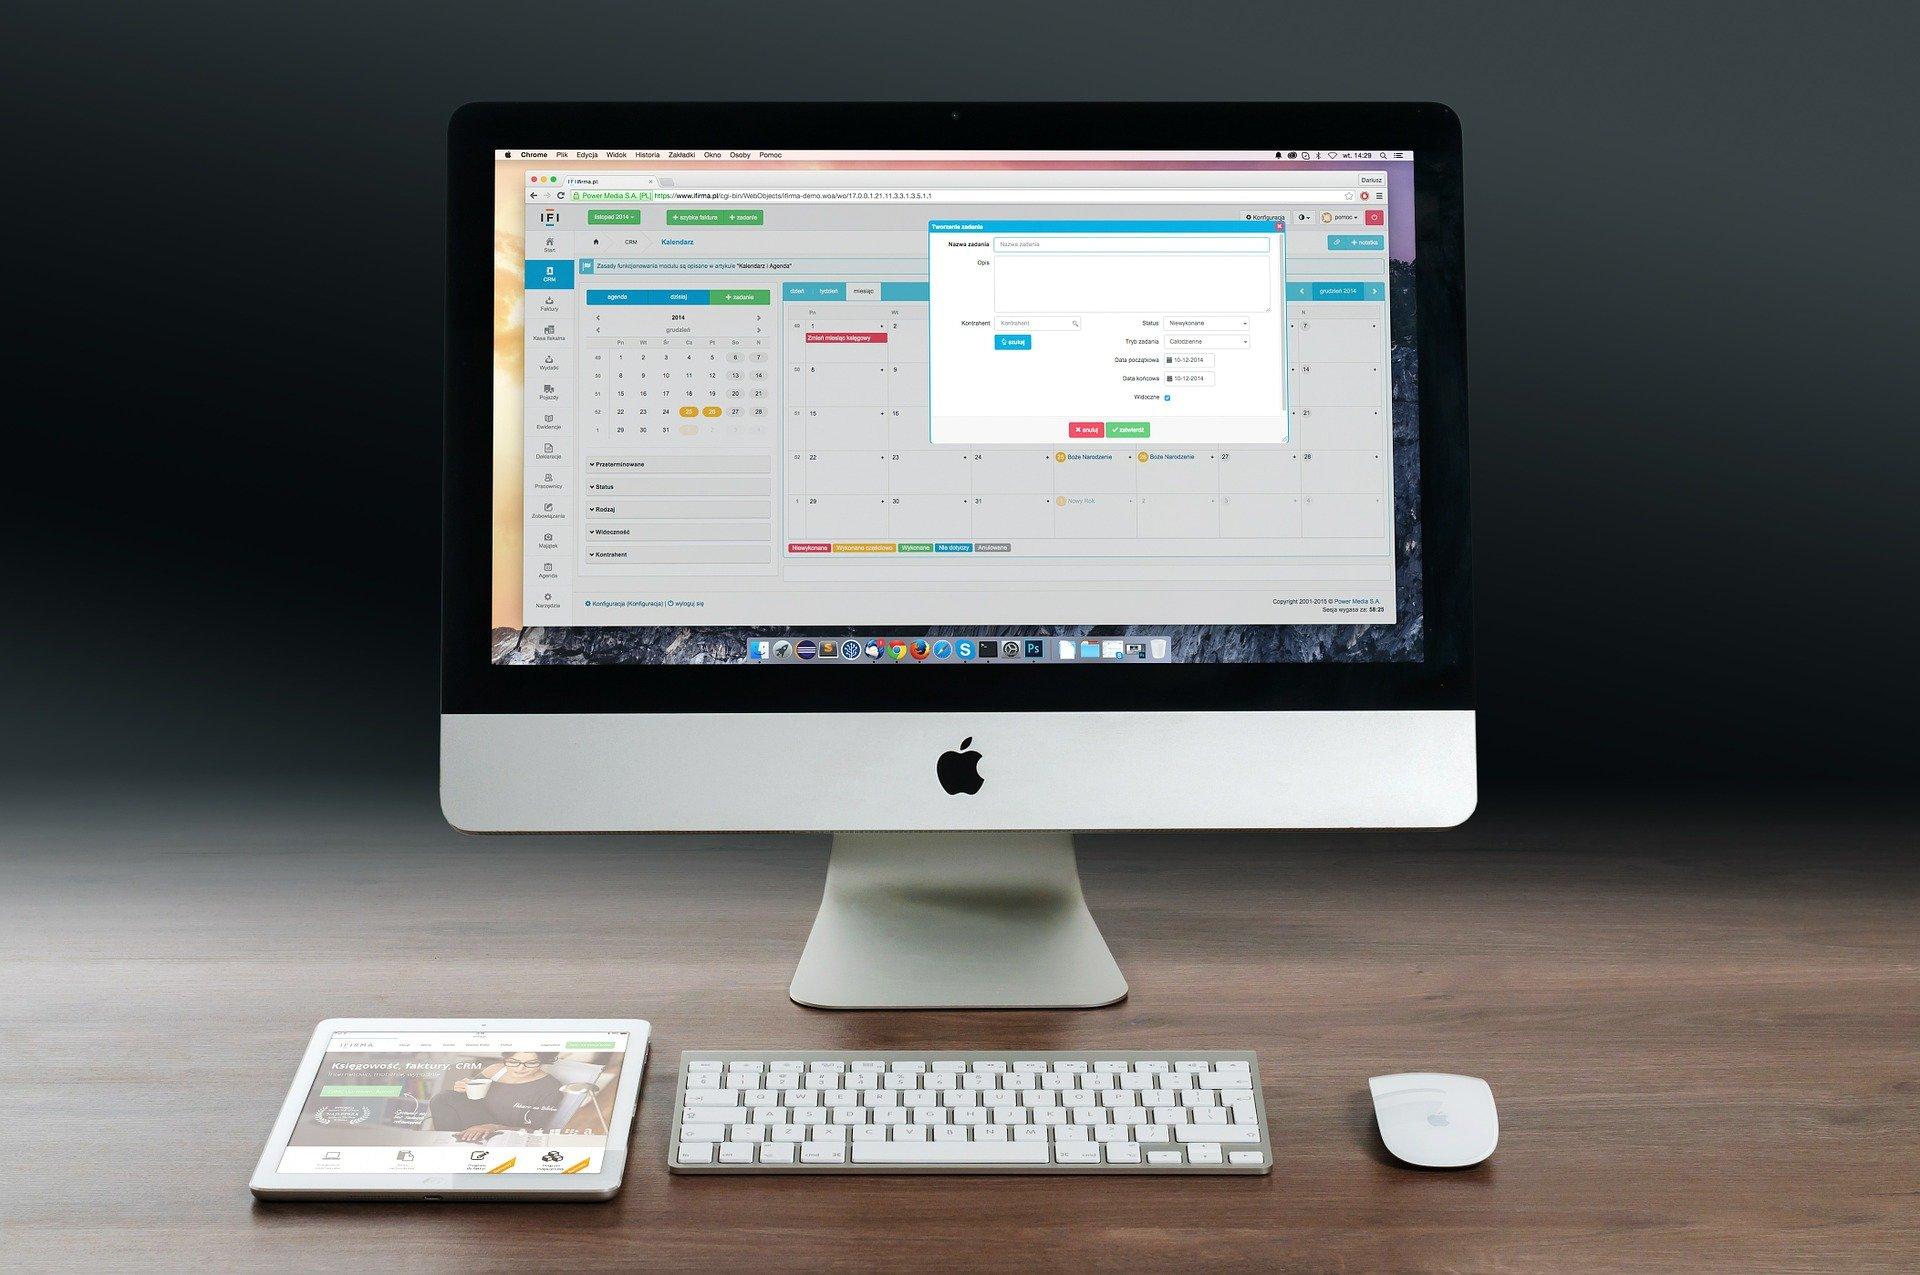 Is Apple environmentally friendly?